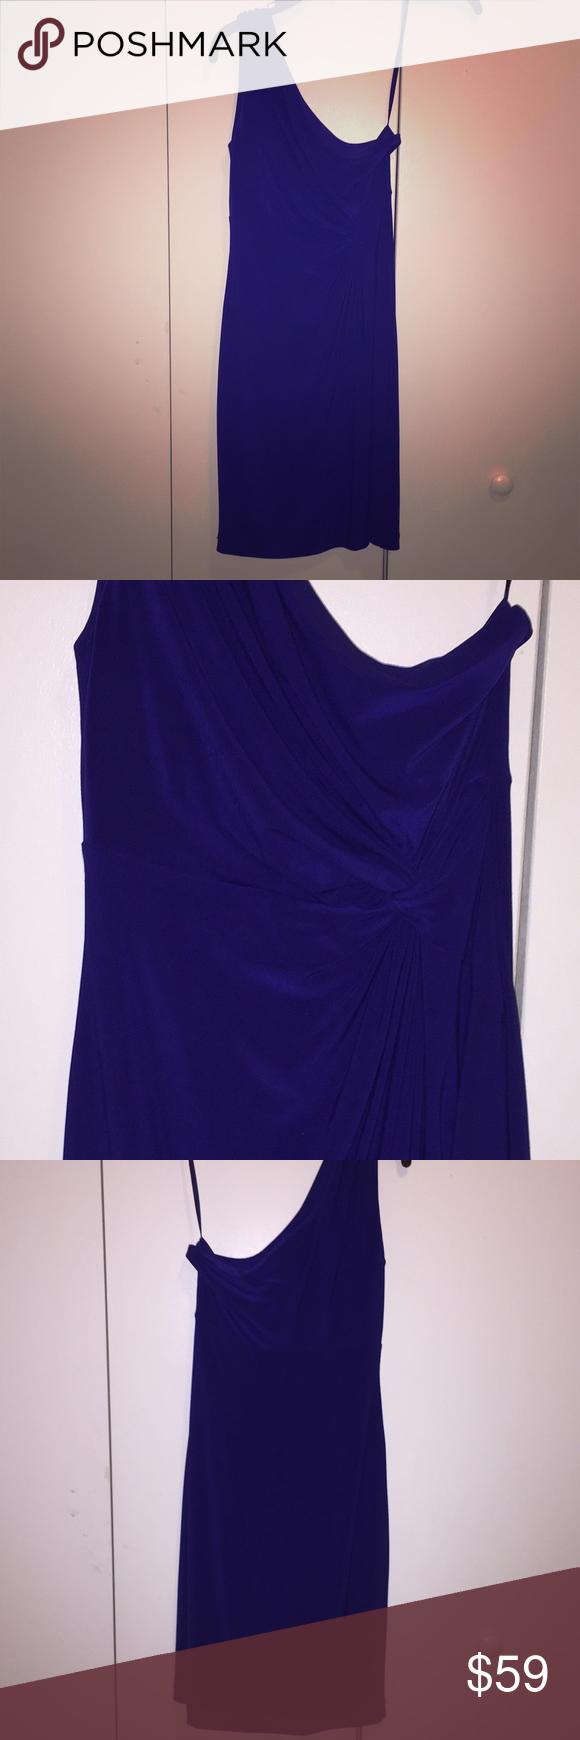 One-shoulder royal blue cocktail dress Excellent condition! Worn once! Lauren Ralph Lauren Dresses One Shoulder